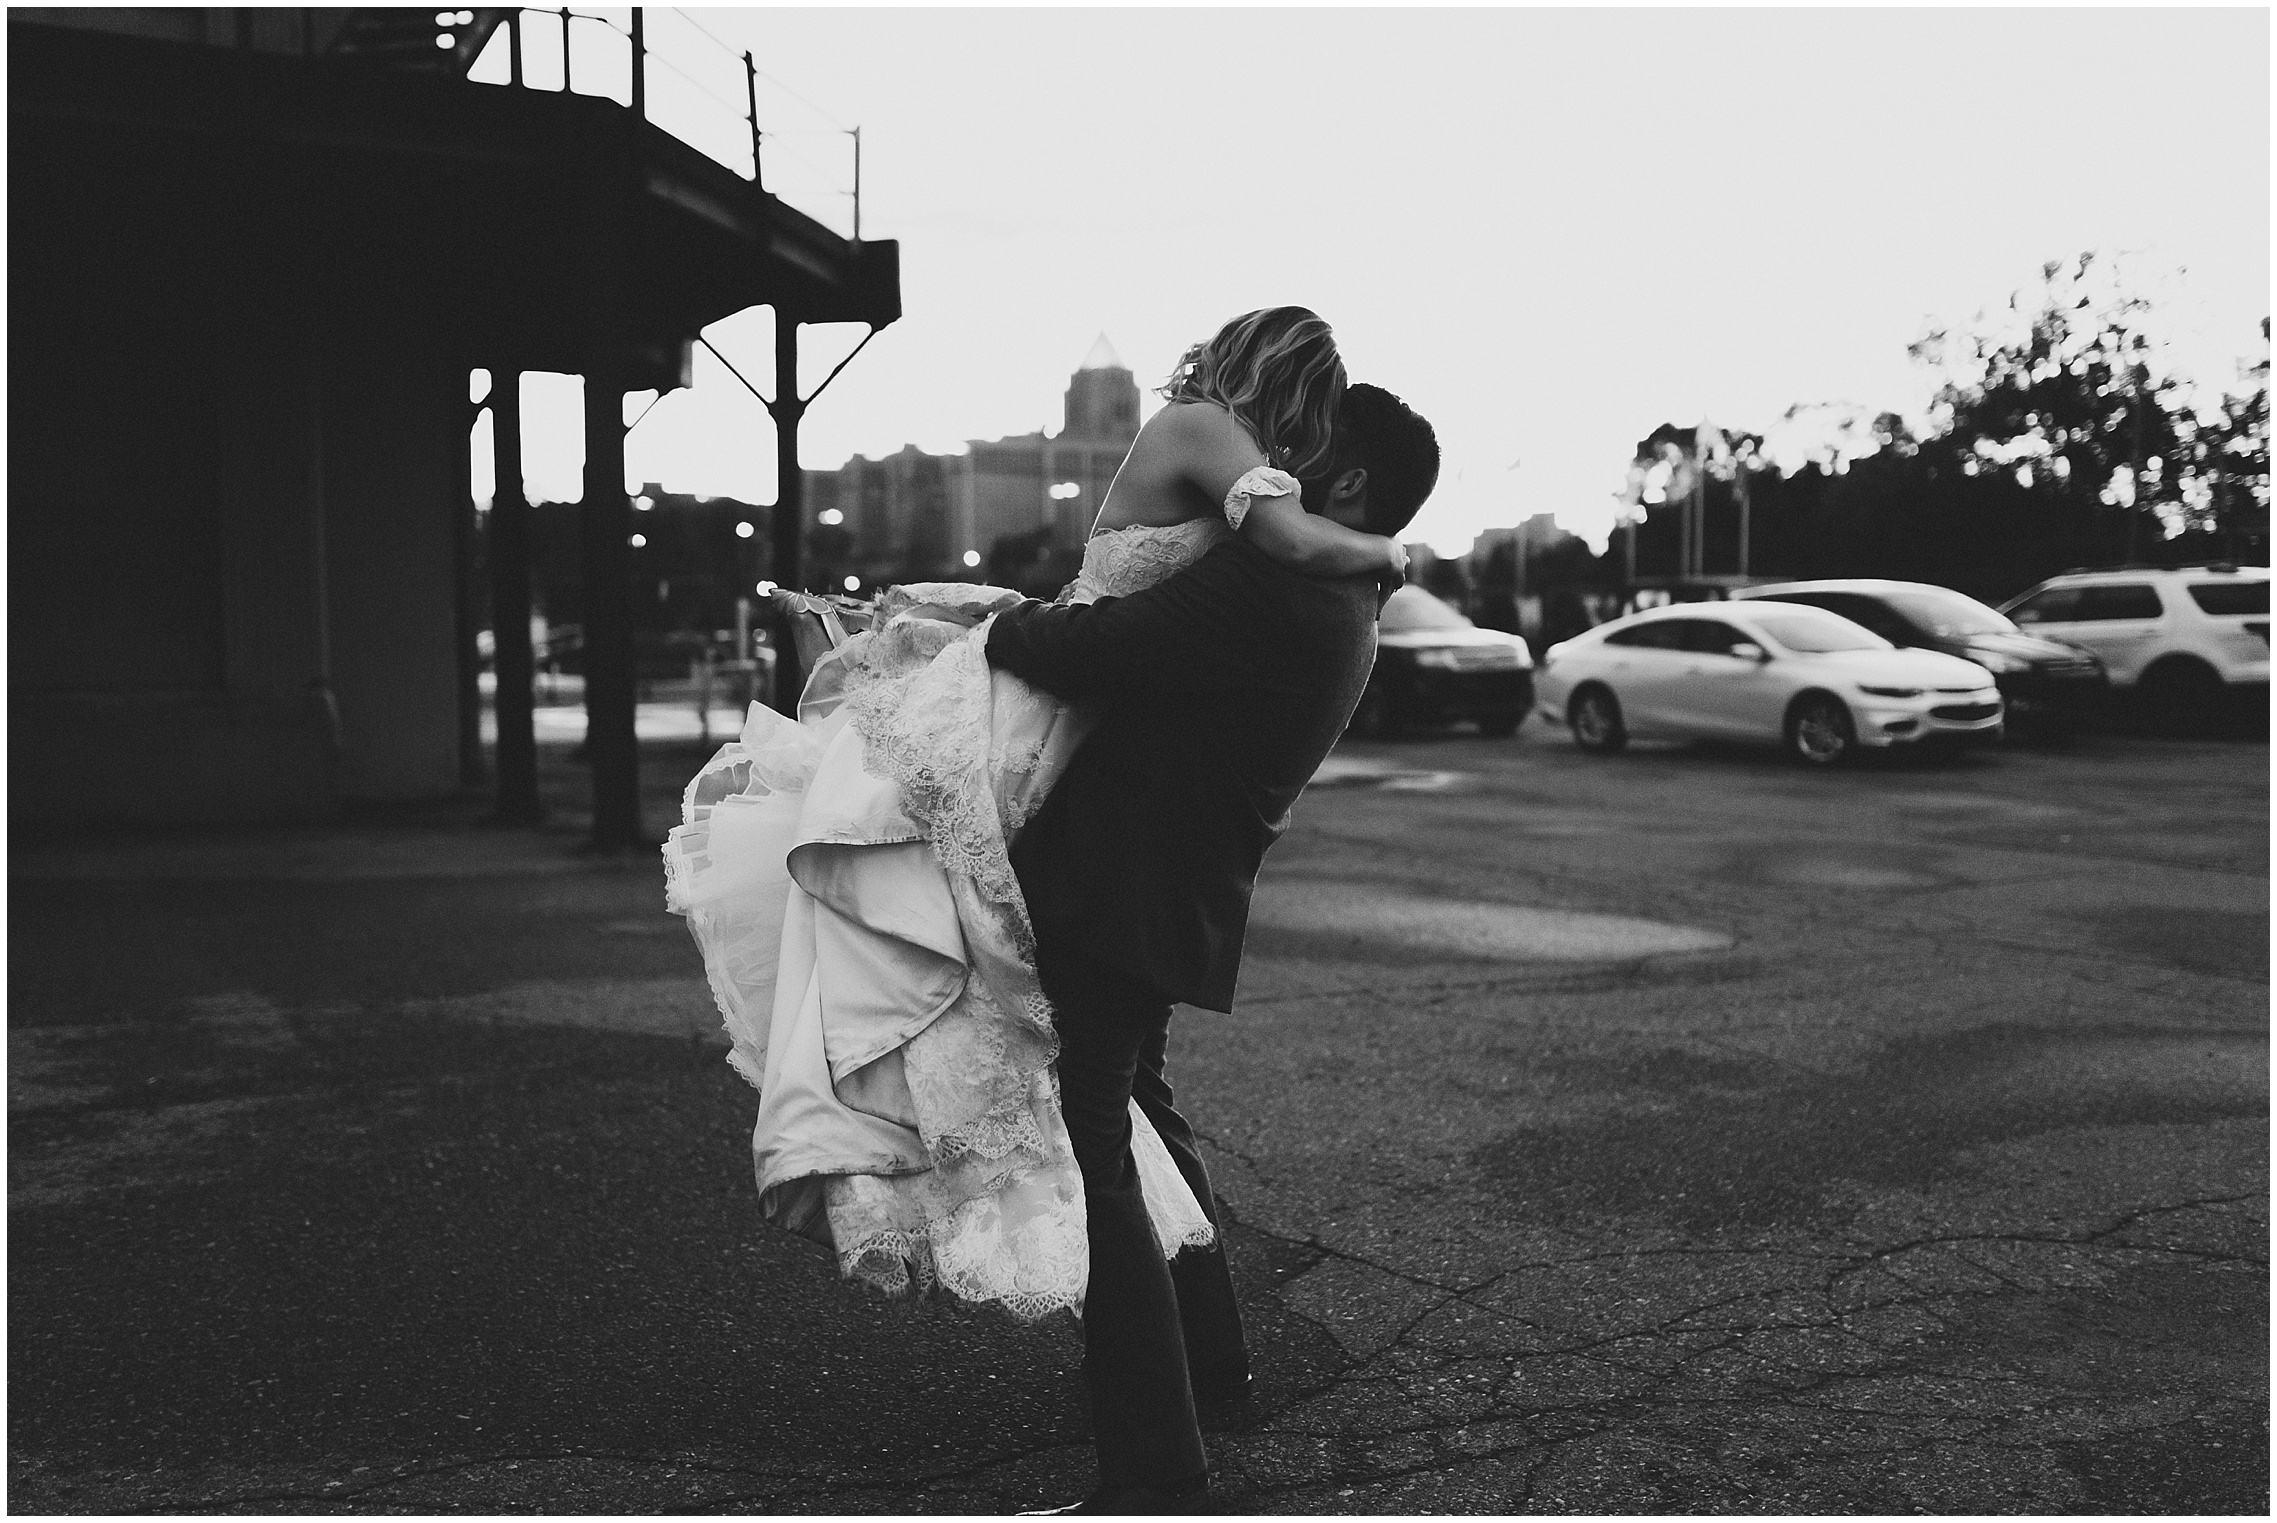 brick_and_mortar_colorado_wedding_photographer_0250.jpg